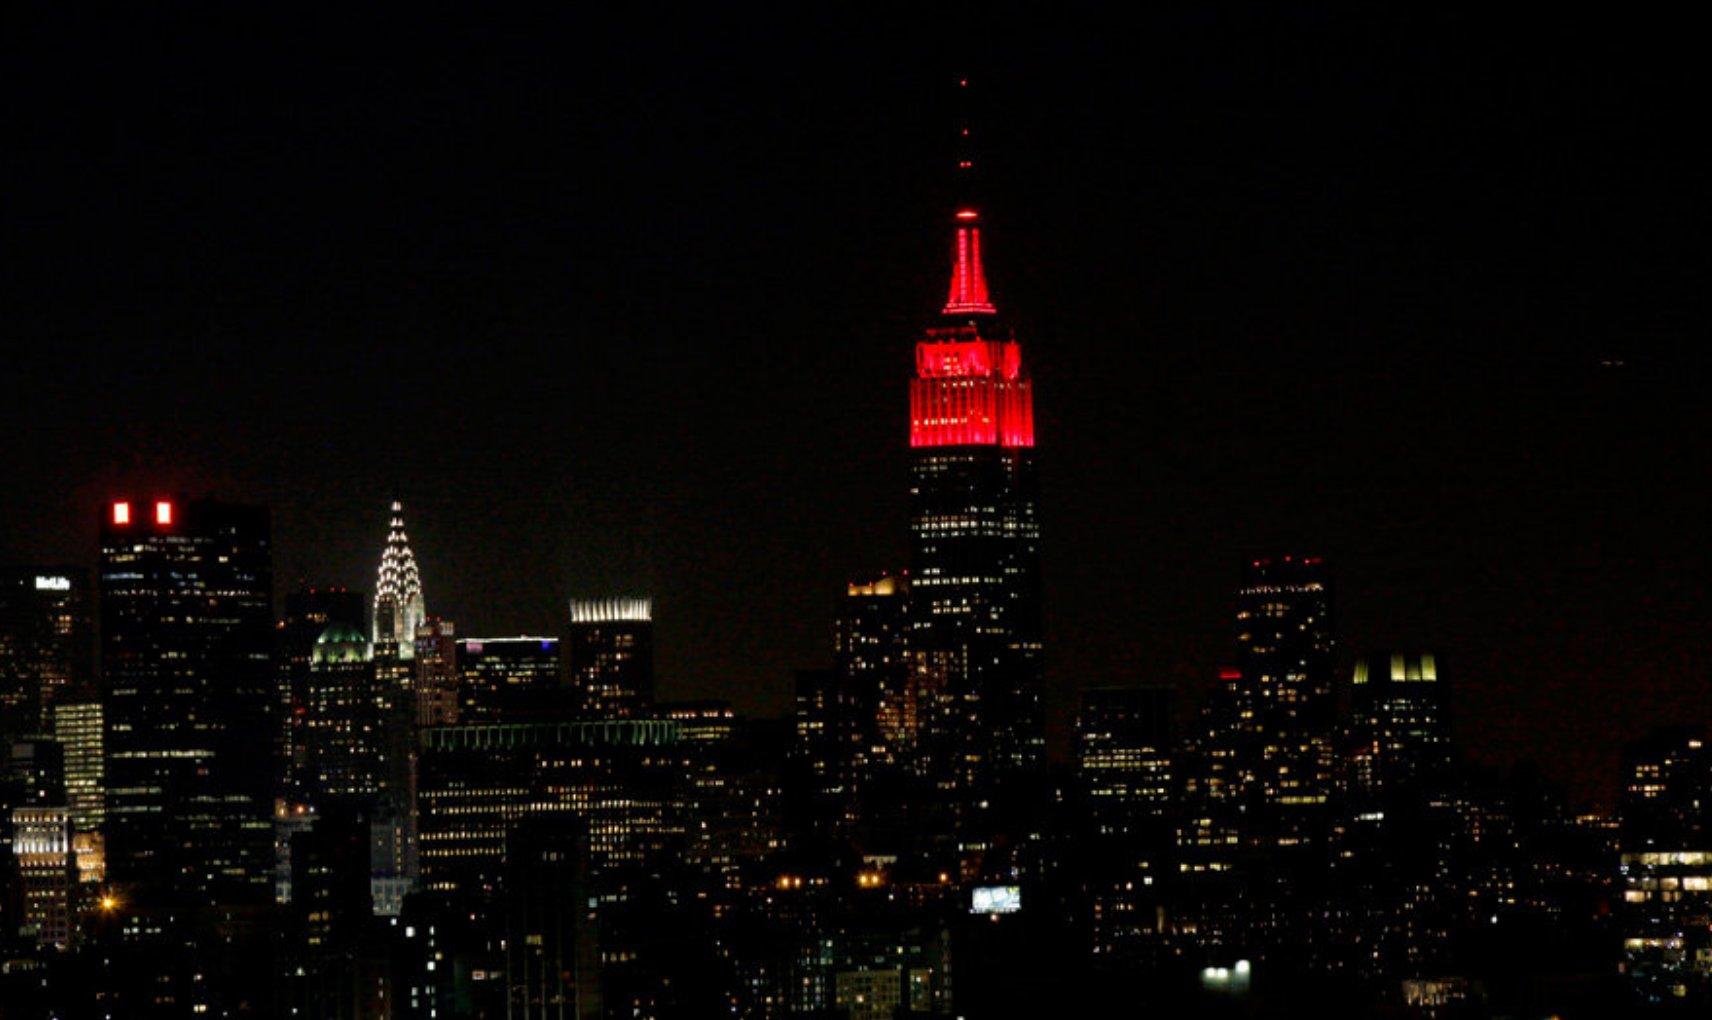 Lots of celebrating @RutgersU last night for #Rutgers250, including fireworks and a scarlet #EmpireStateBuilding. Check out that skyline! https://t.co/vXrRibmVdS